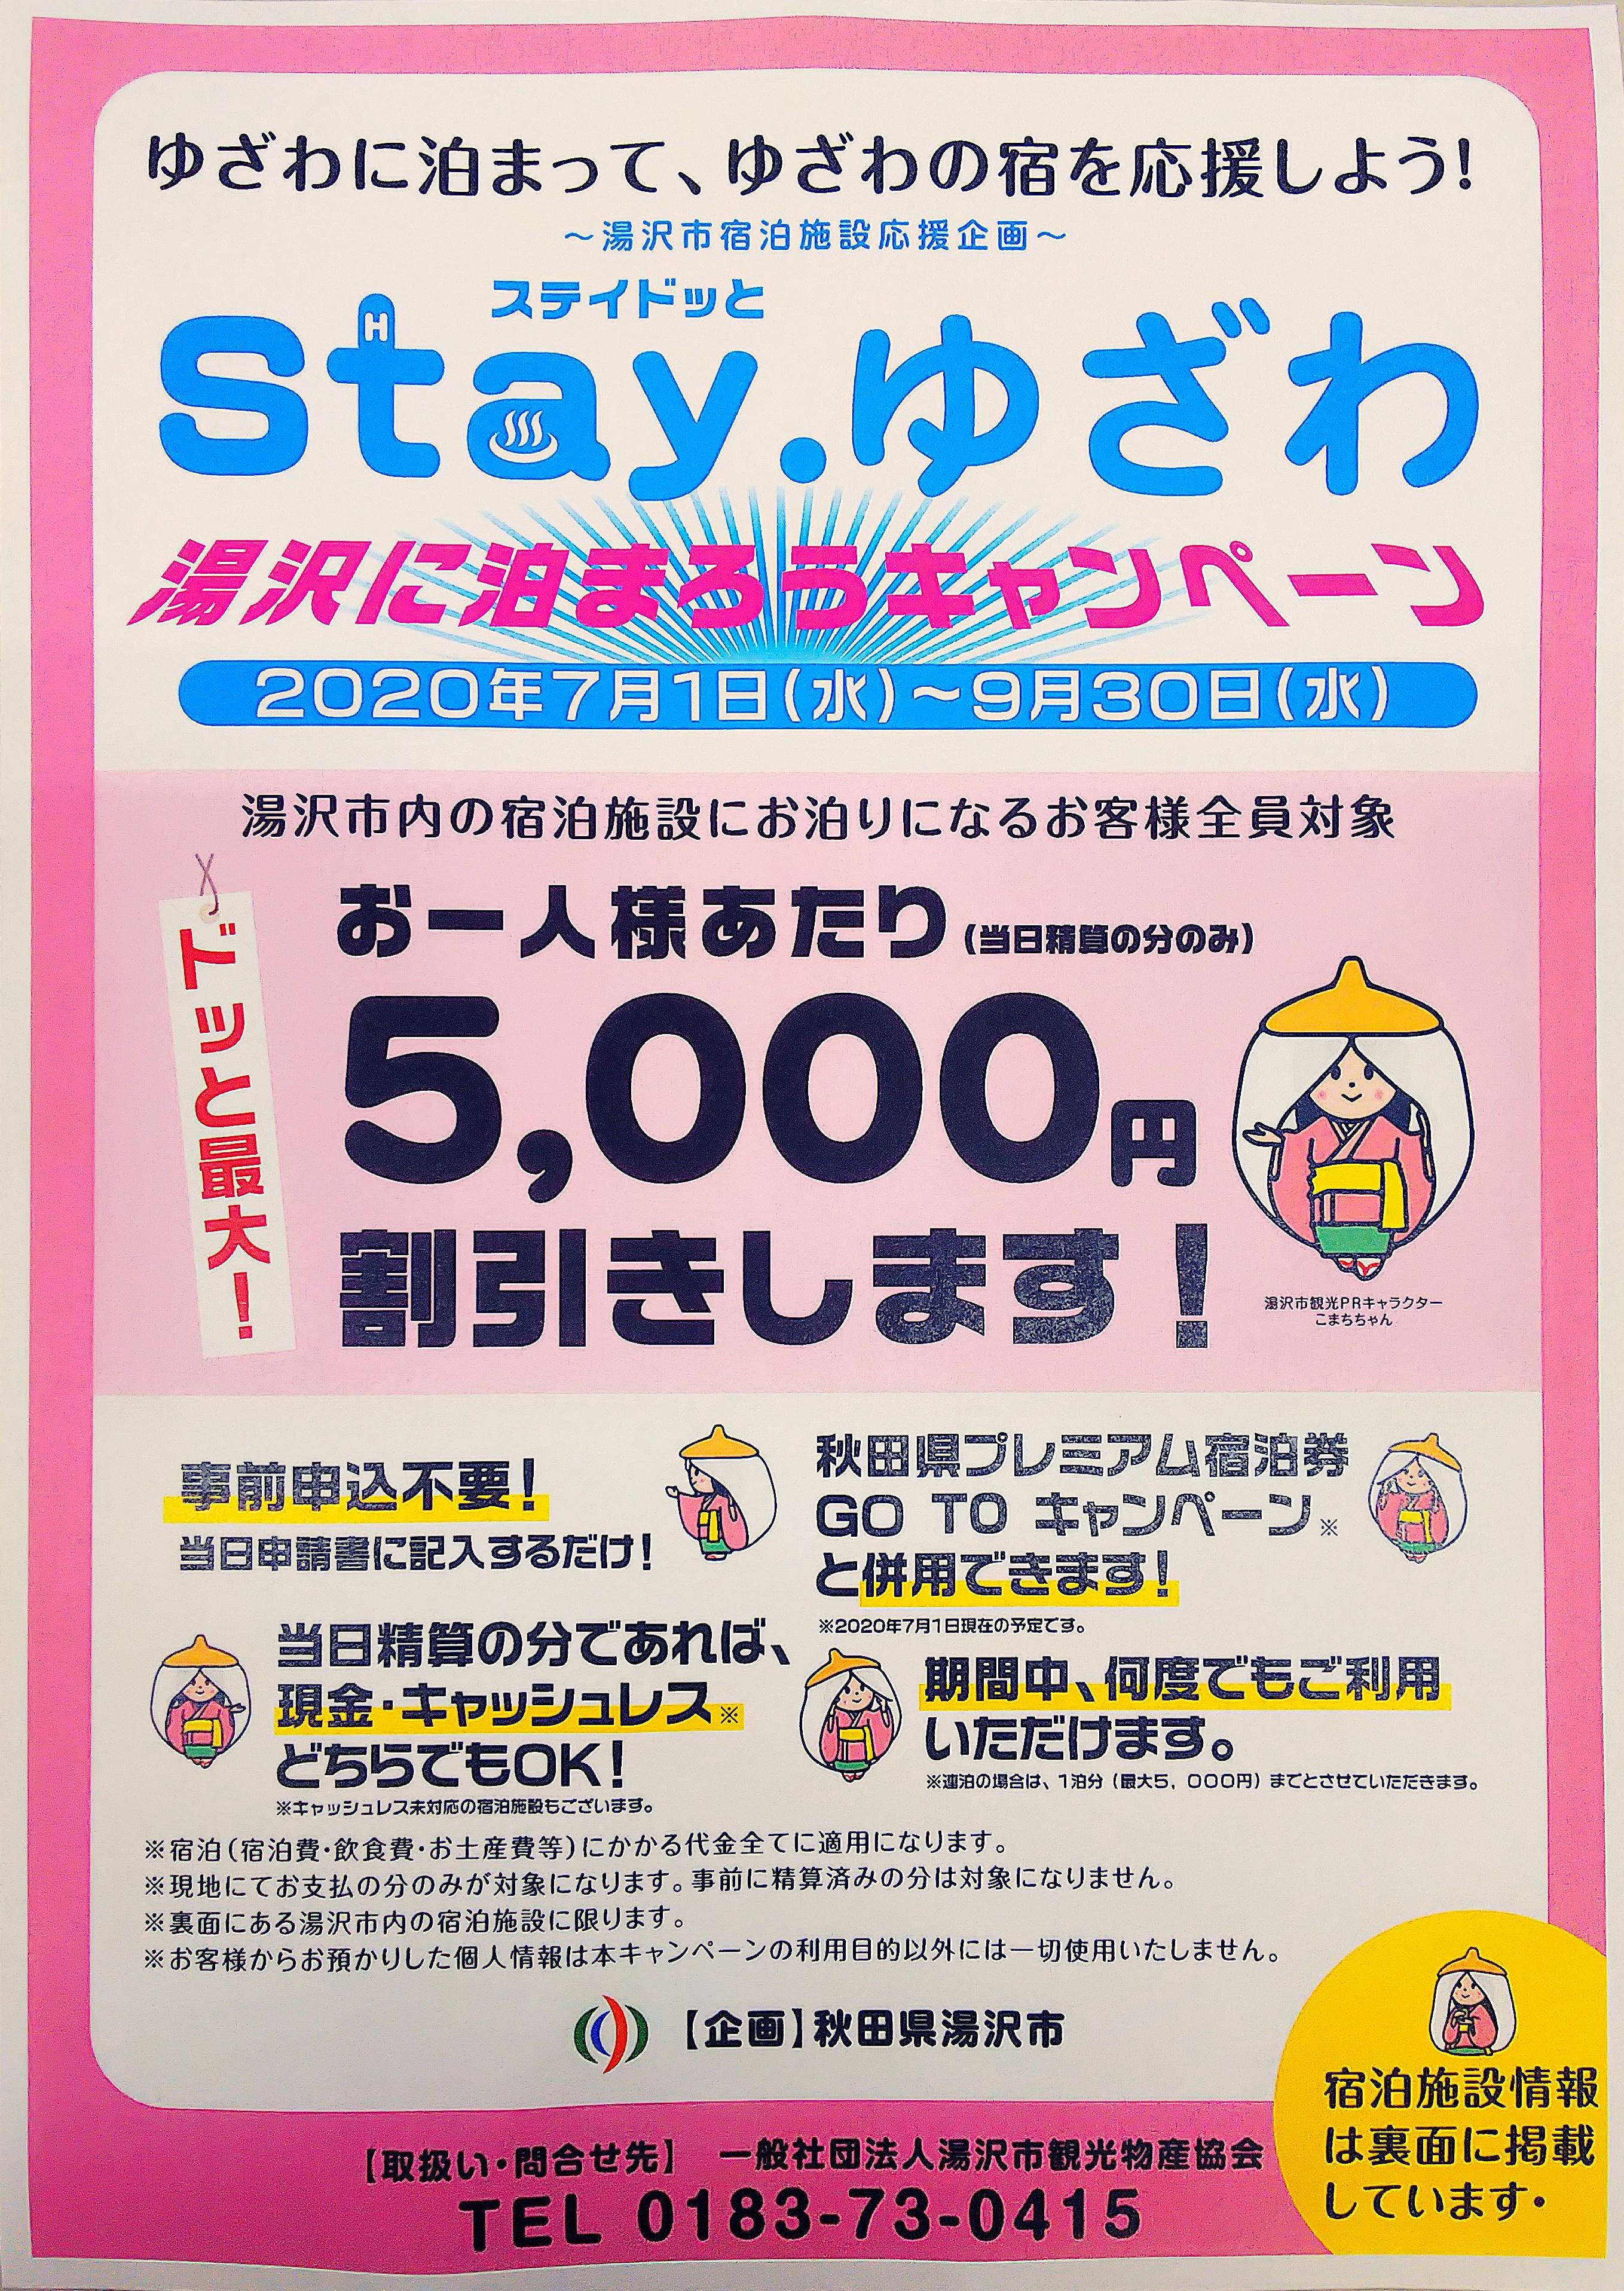 http://www.fukukomachi.com/blog/photo/C360_2020-07-21-16-40-14-991.jpg